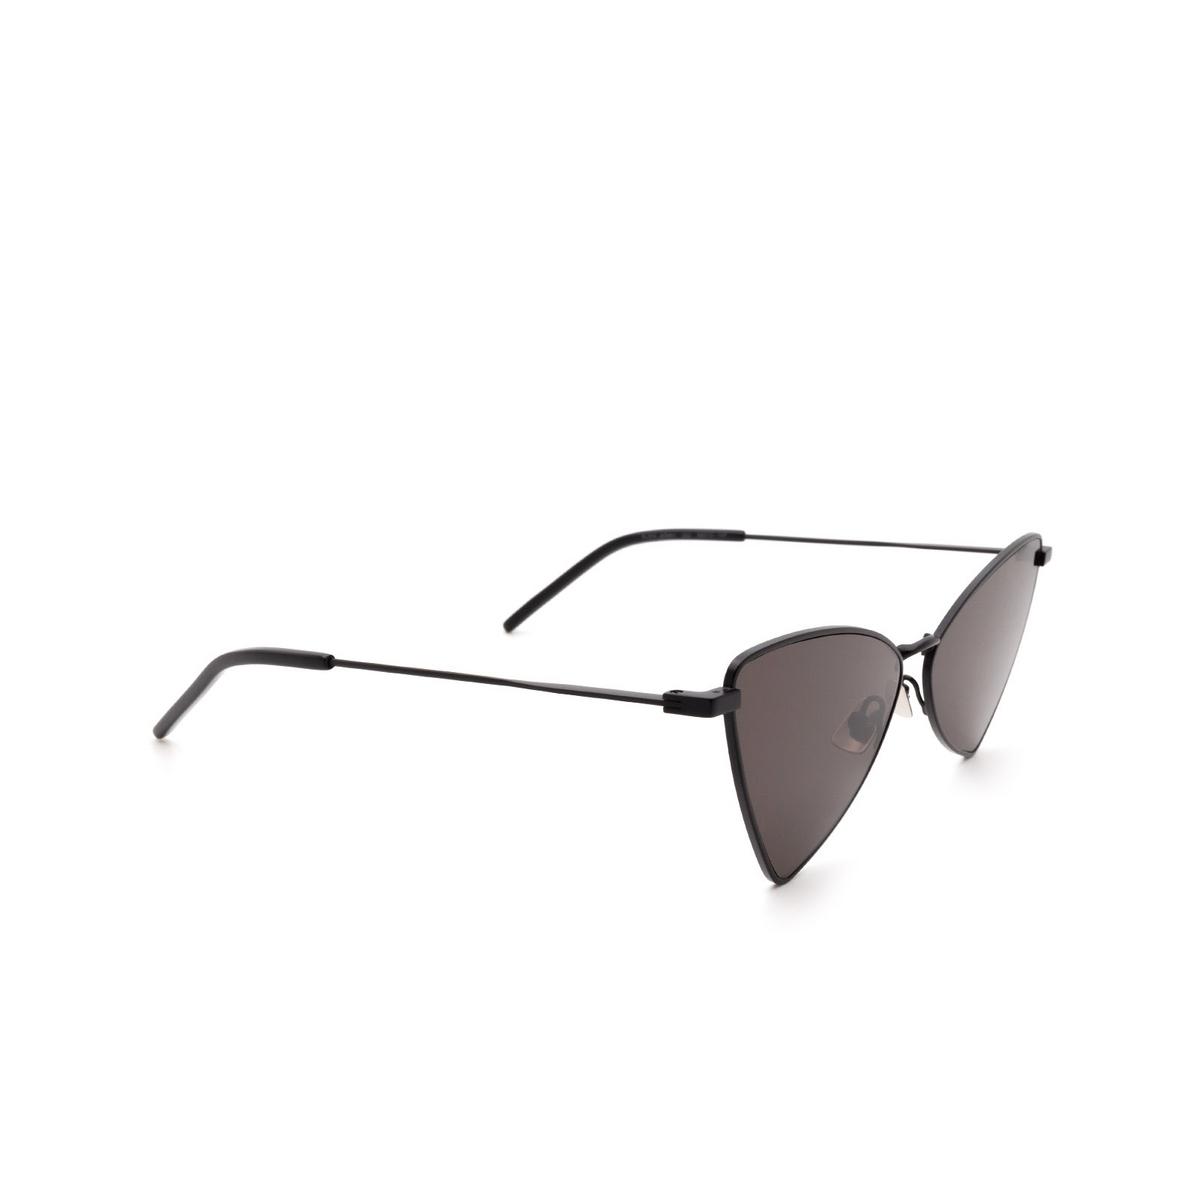 Saint Laurent® Irregular Sunglasses: Jerry SL 303 color Black 002.